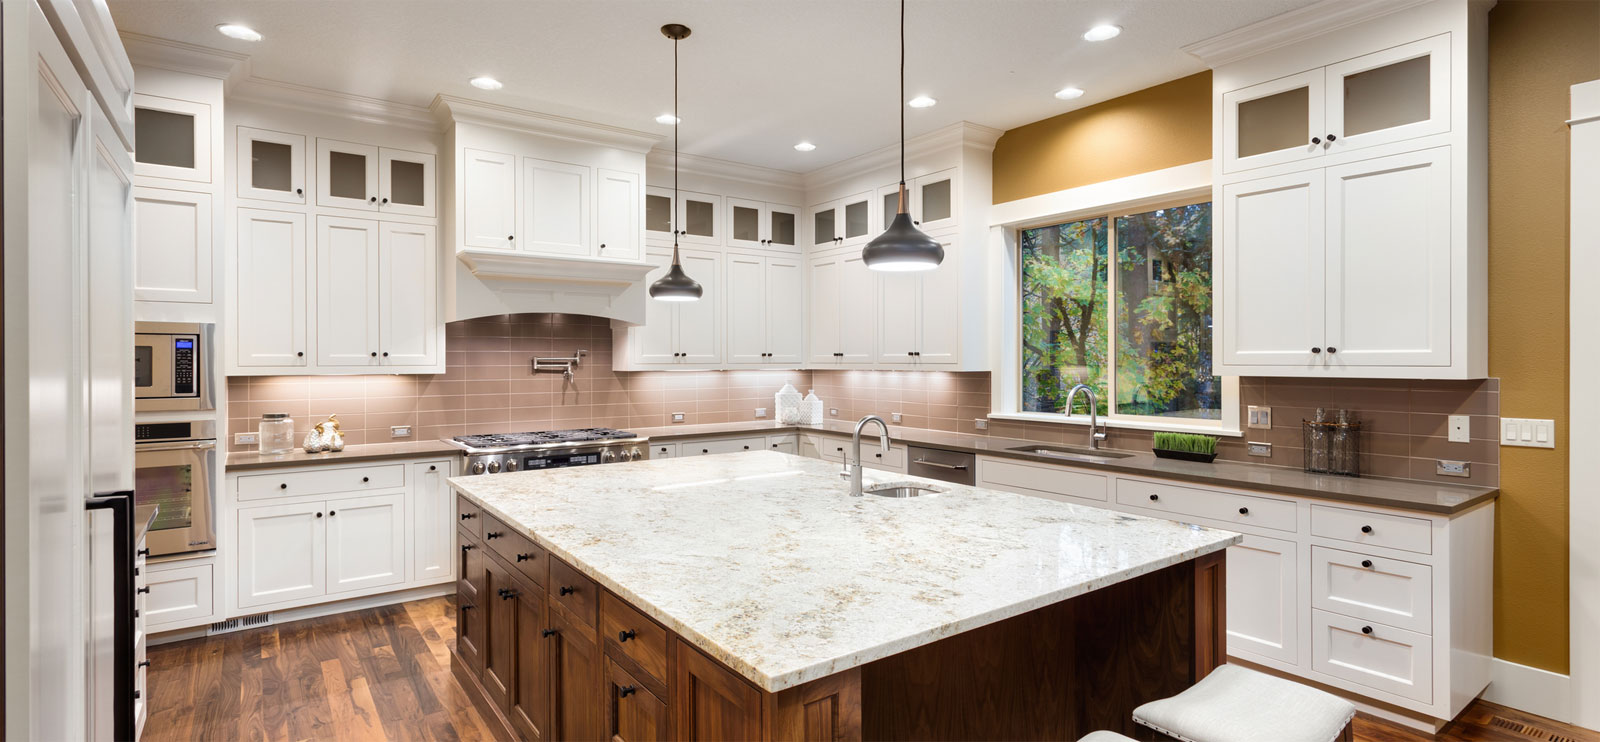 Kitchen Area - Winter Park Rental Home